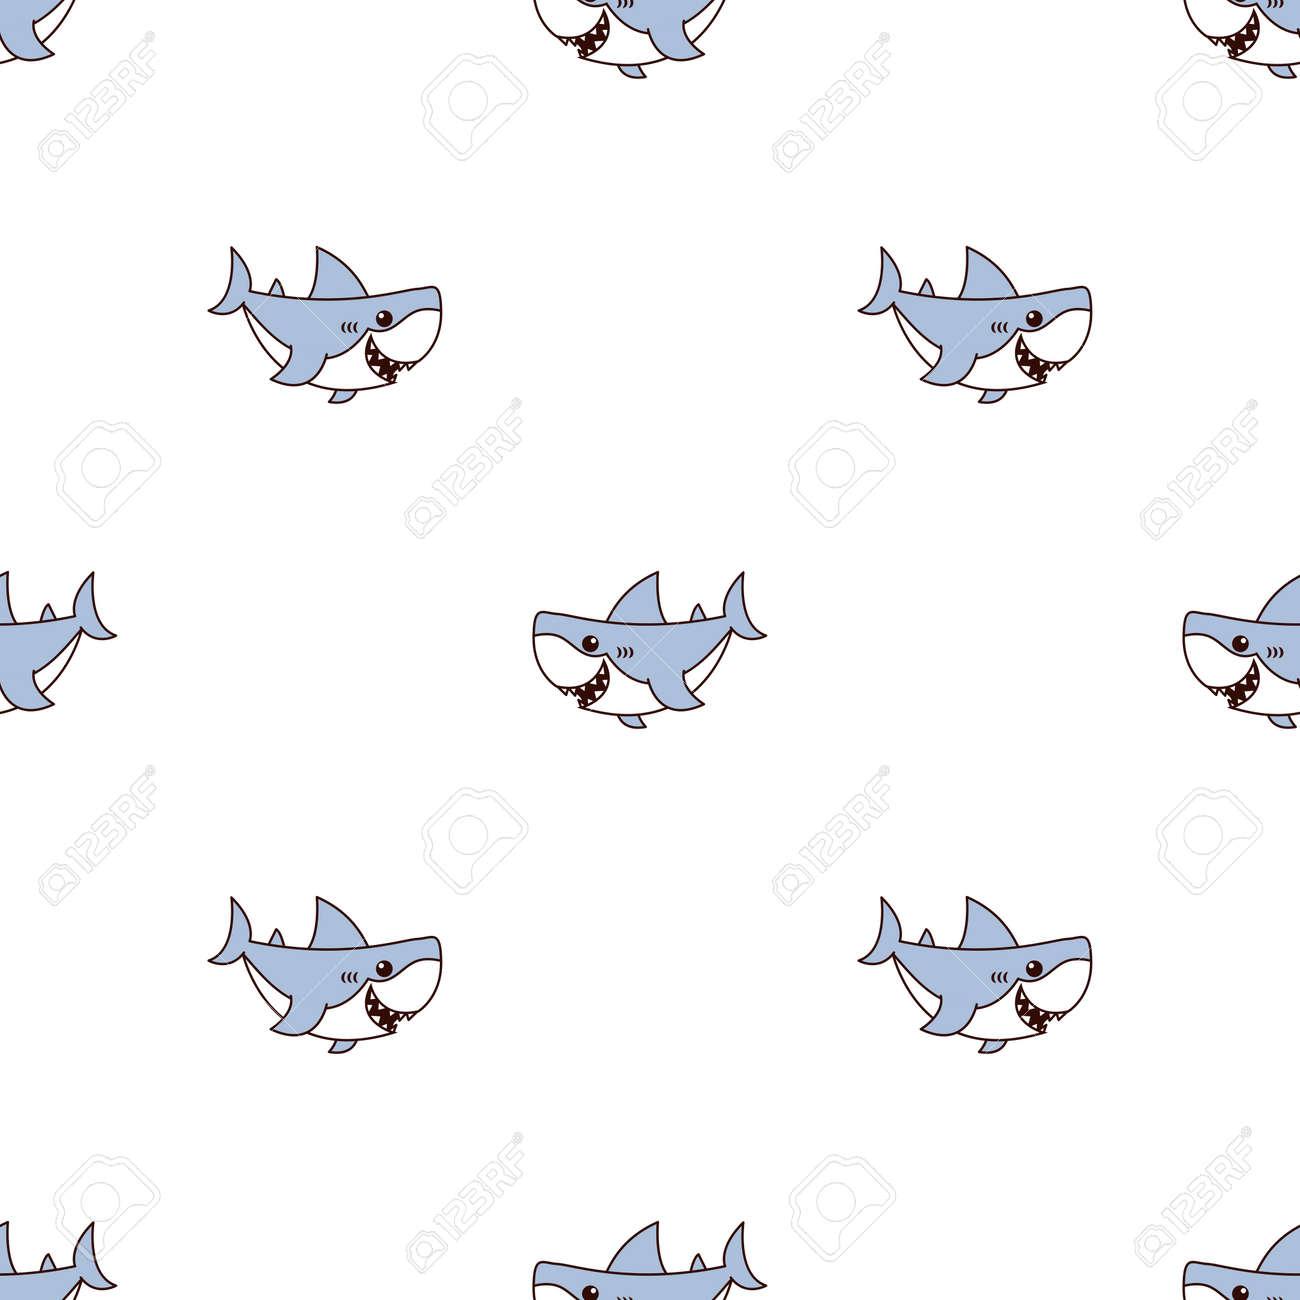 Cute shark cartoon seamless pattern, vector illustration - 170584579